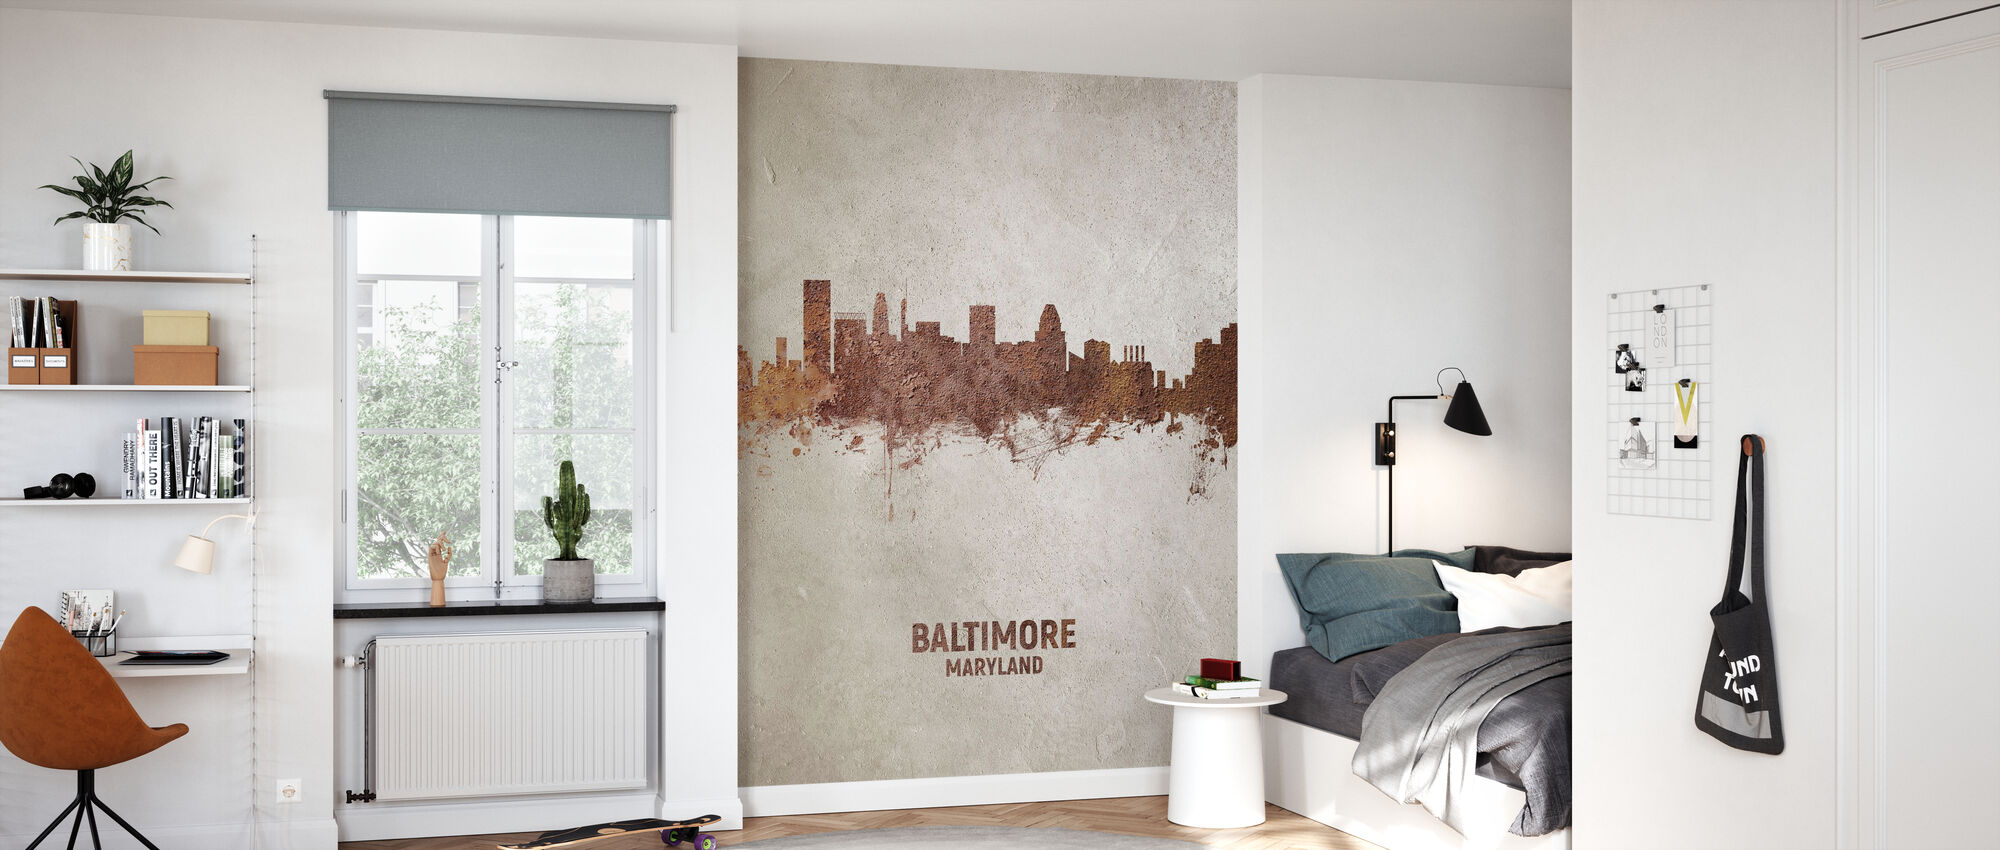 Baltimore Maryland Rust Skyline - Wallpaper - Kids Room